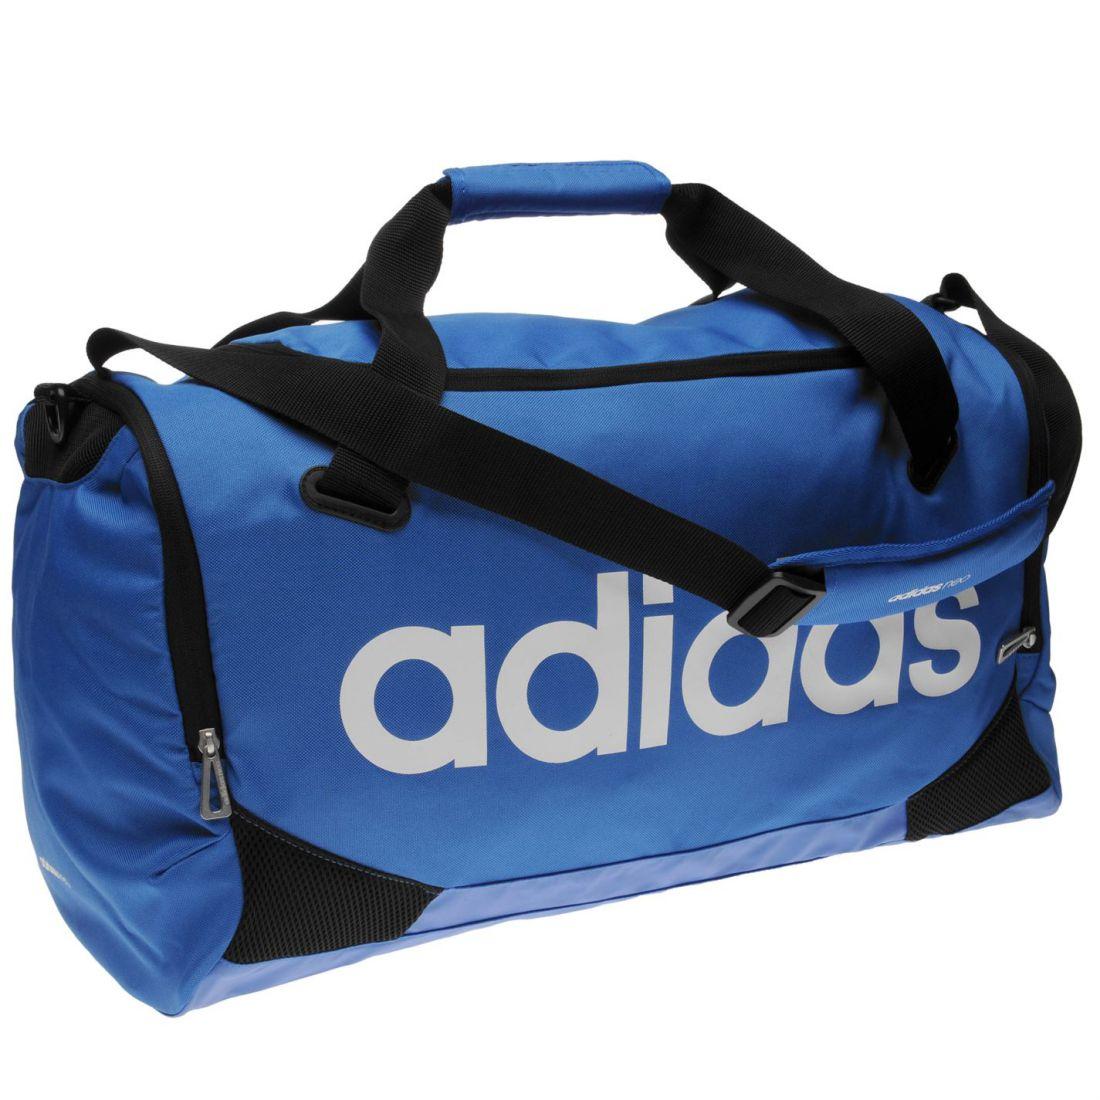 adidas Lin Team Bag Medium Holdall Travel Storage Luggage Accessories 98f4bbf39c